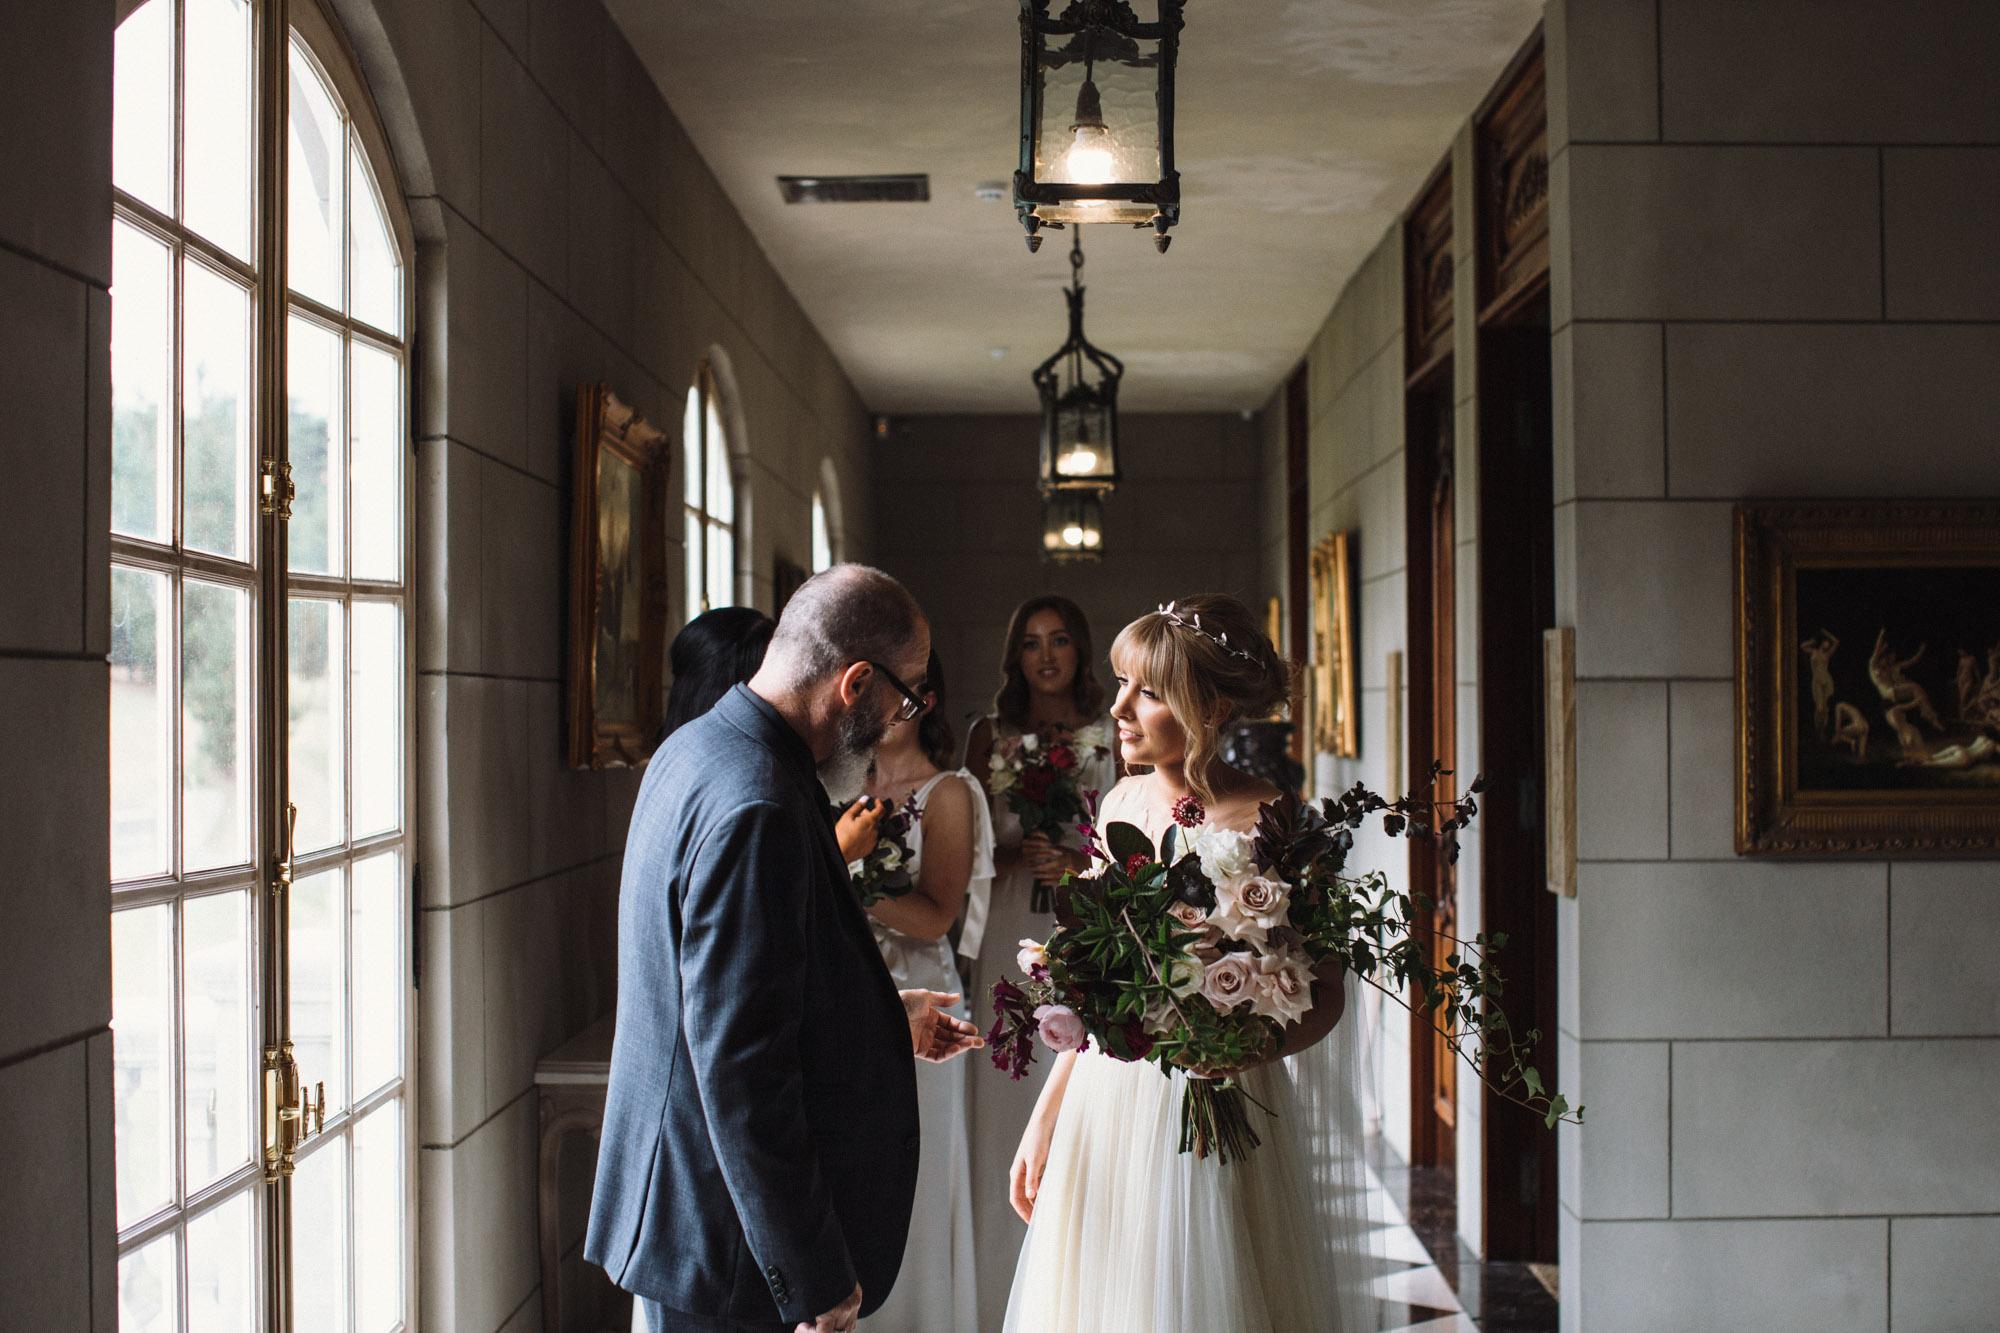 Campbell Point House Wedding HJ + Dean Raphael Weddings-53.jpg